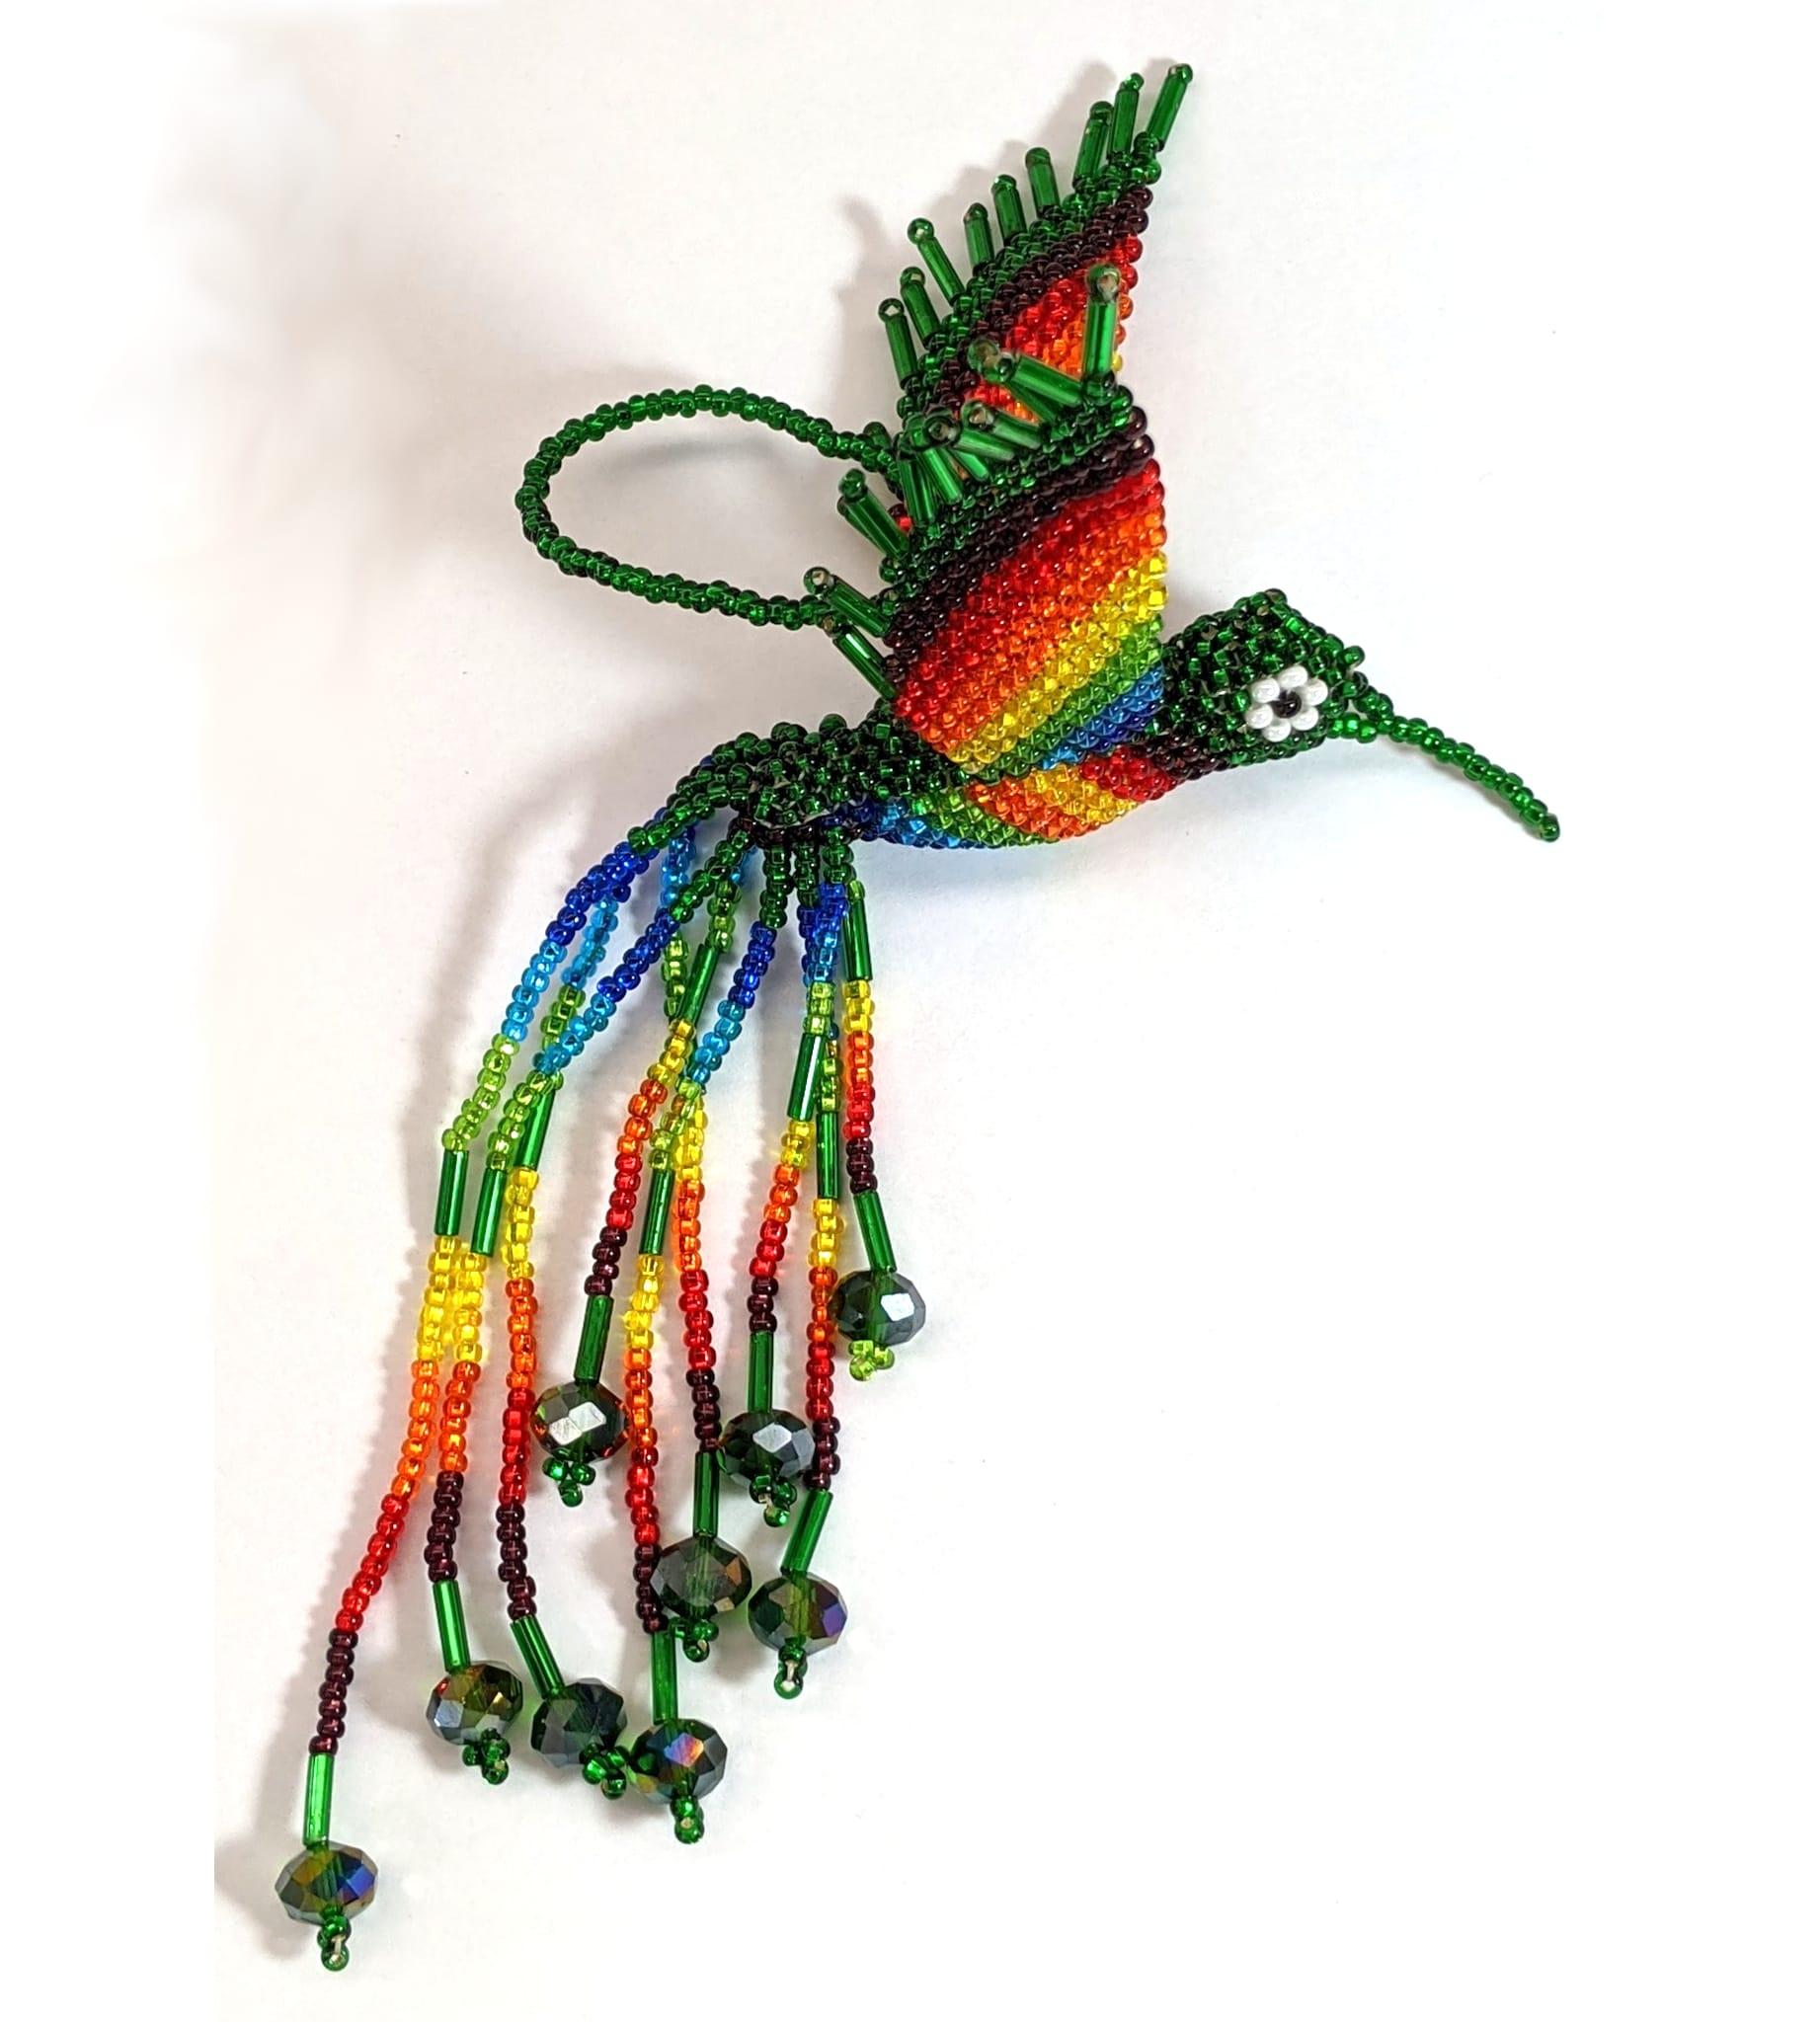 Hummingbird Beaded Ornament - Rainbow with Deep Green